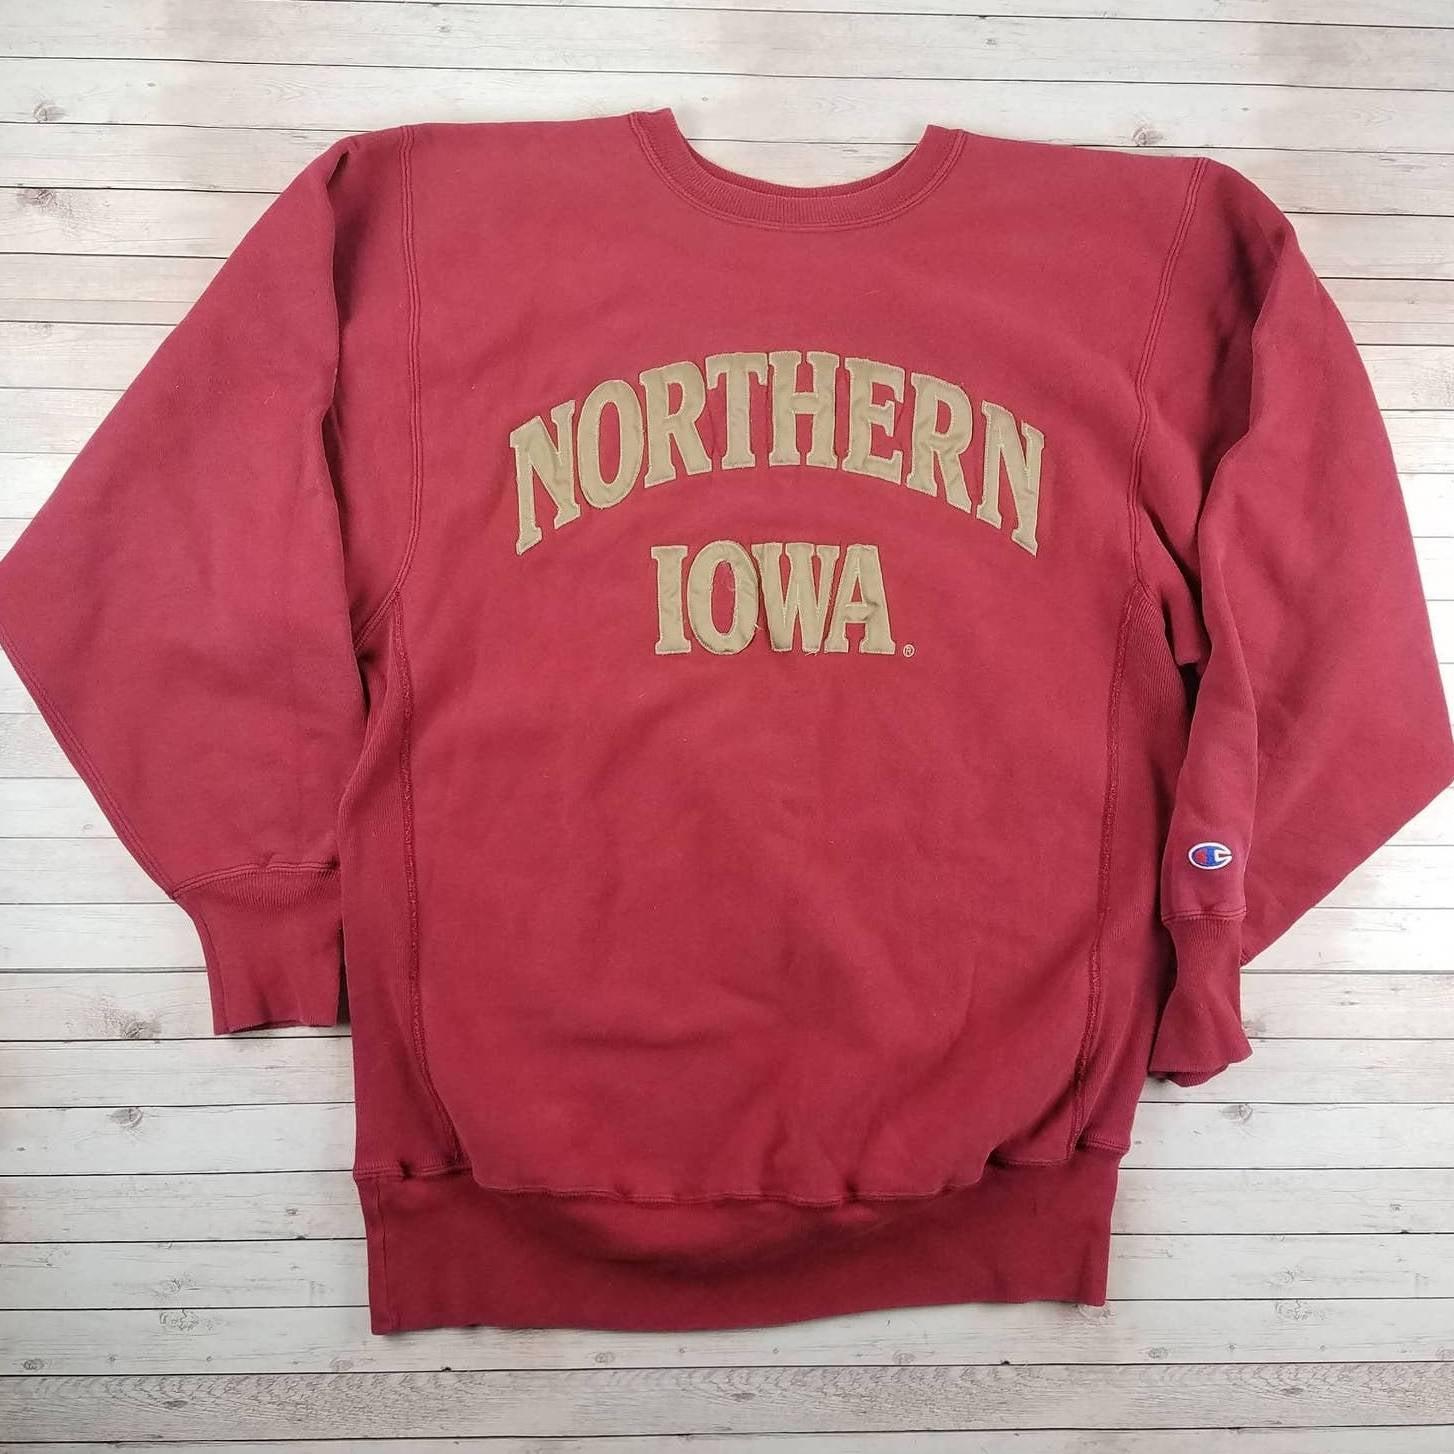 VTG 90s Iowa Reverse Weave Sweatshirt